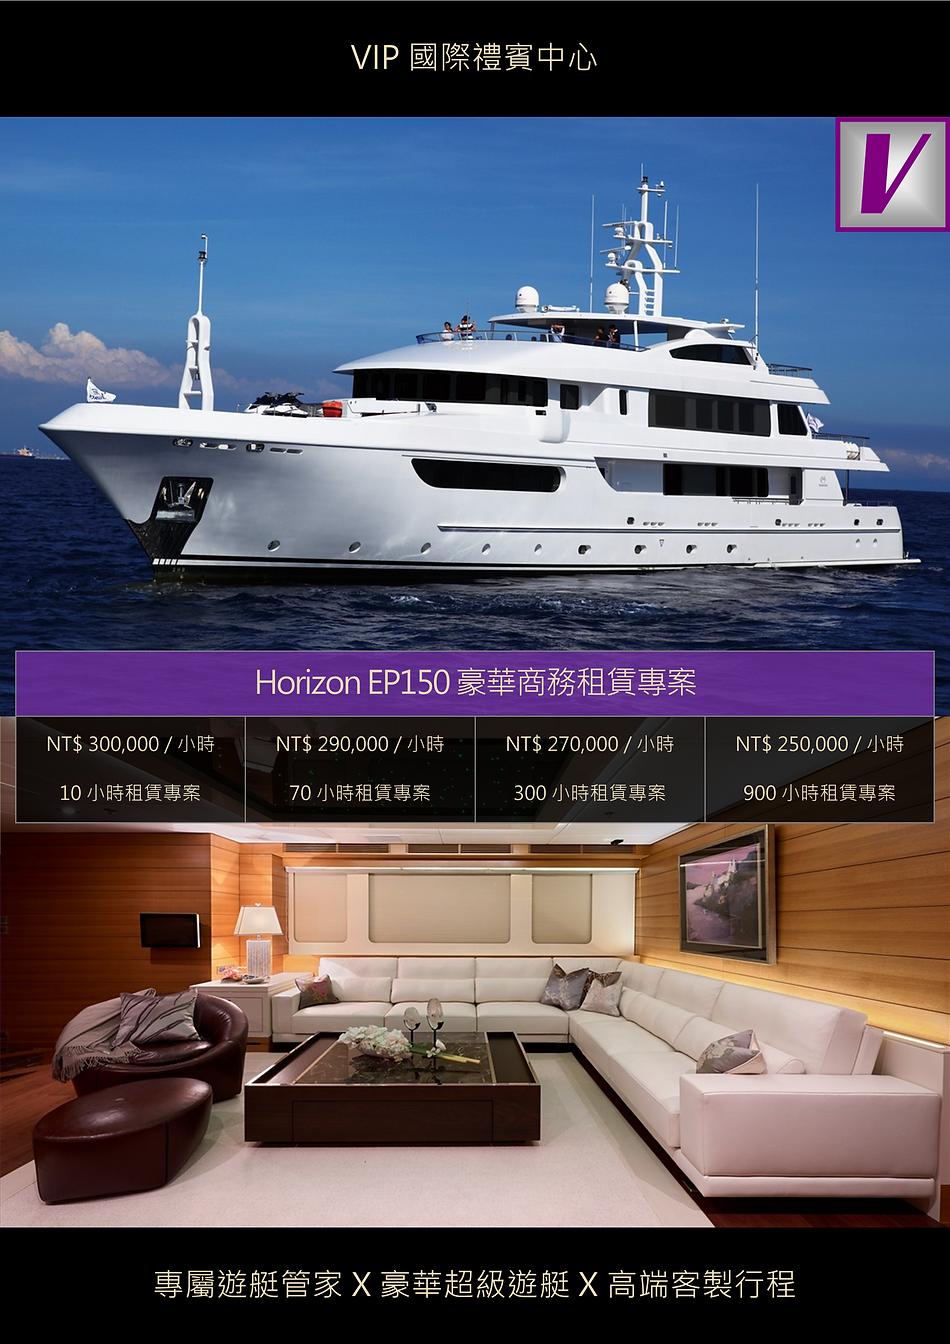 VIP國際禮賓中心 HORIZON EP150 豪華商務租賃專案 DM.png